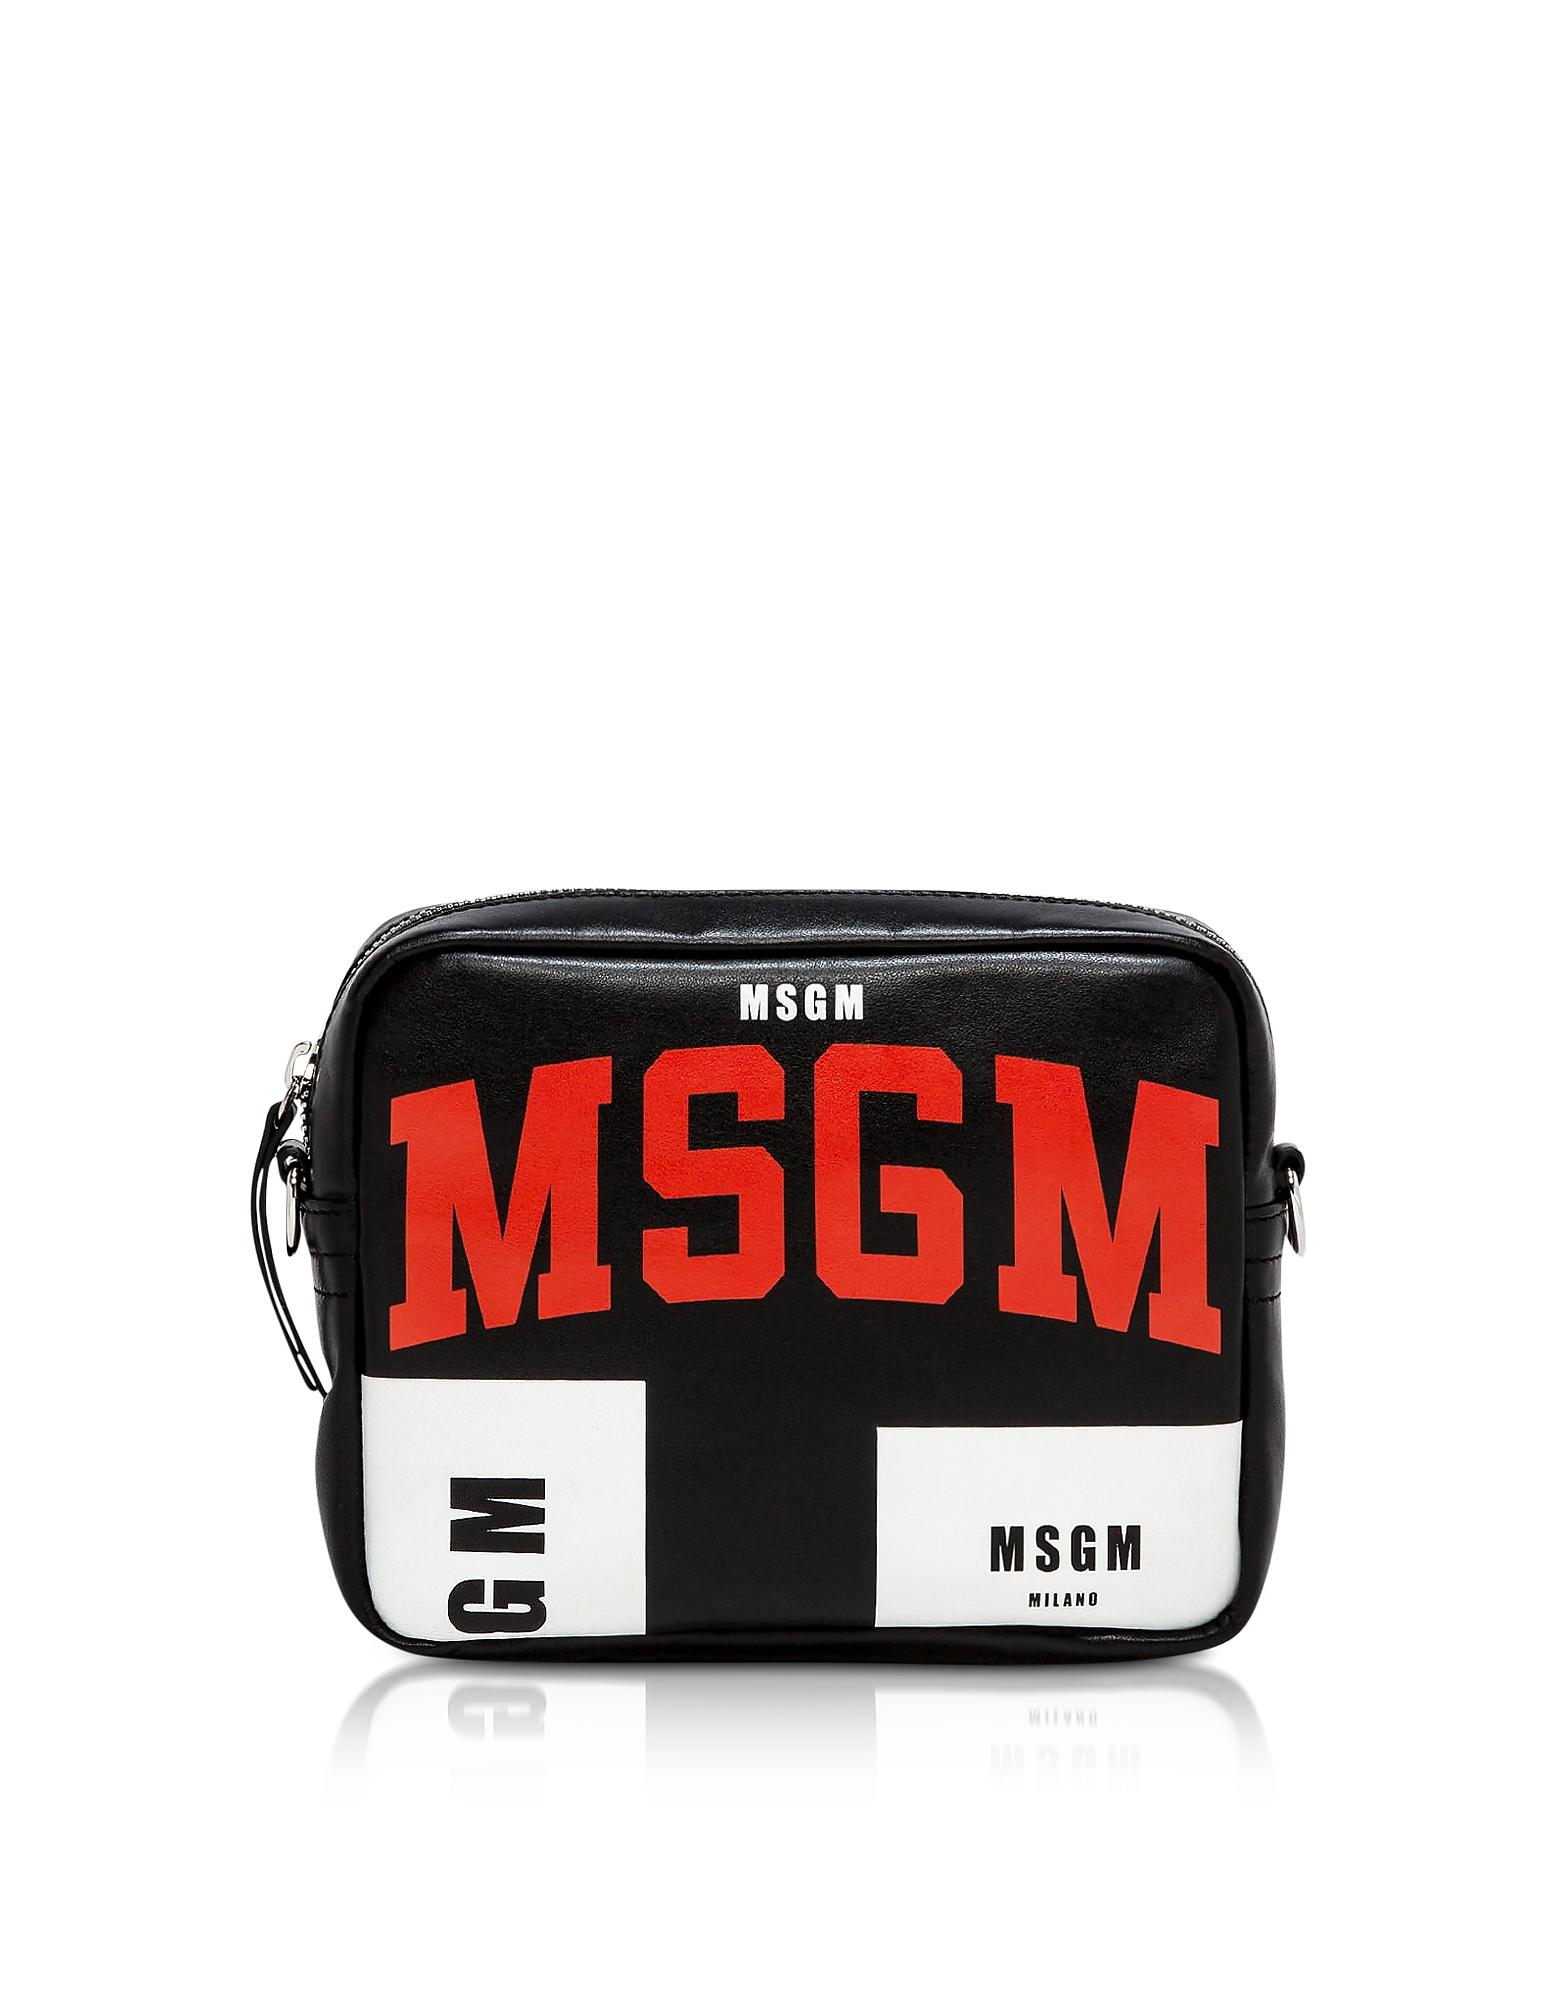 MSGM Black Crossbody Bag w/ Signature